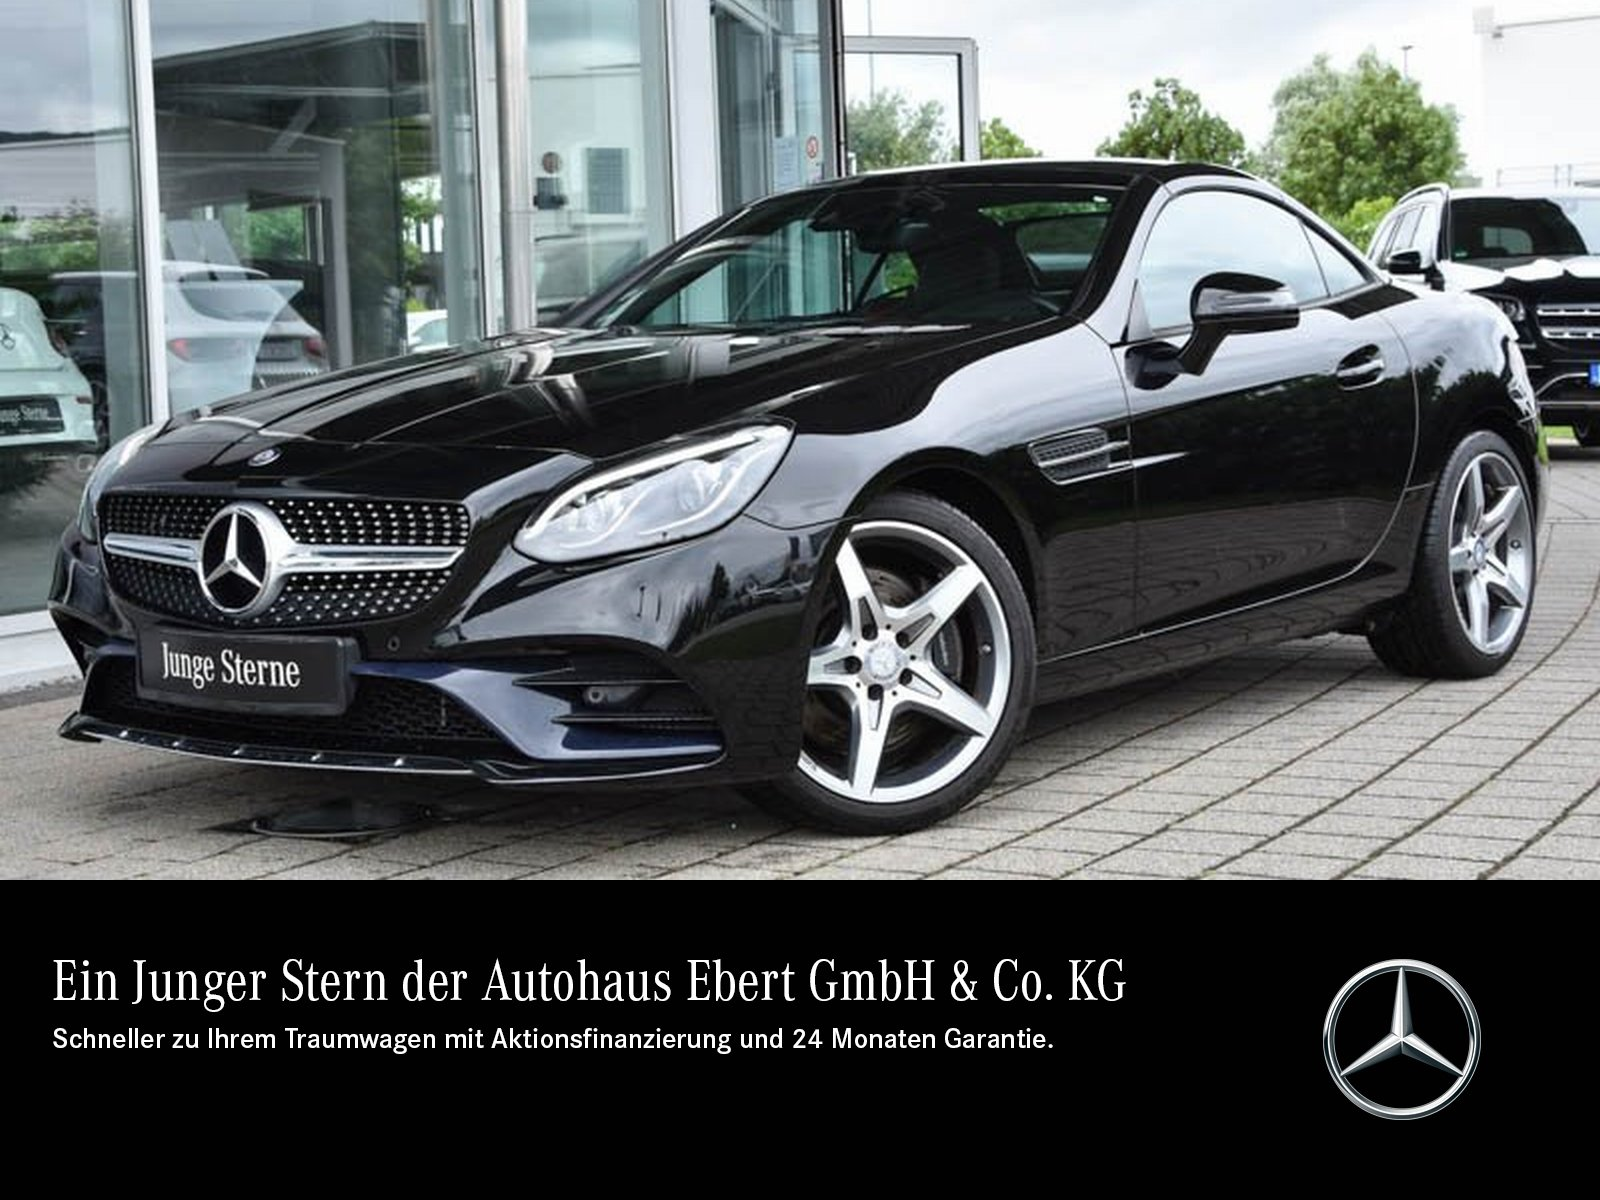 Mercedes-Benz SLC 200 AMG 9G+NAVI+VARIO+LED+PTS+SPORT-ABGAS, Jahr 2016, Benzin